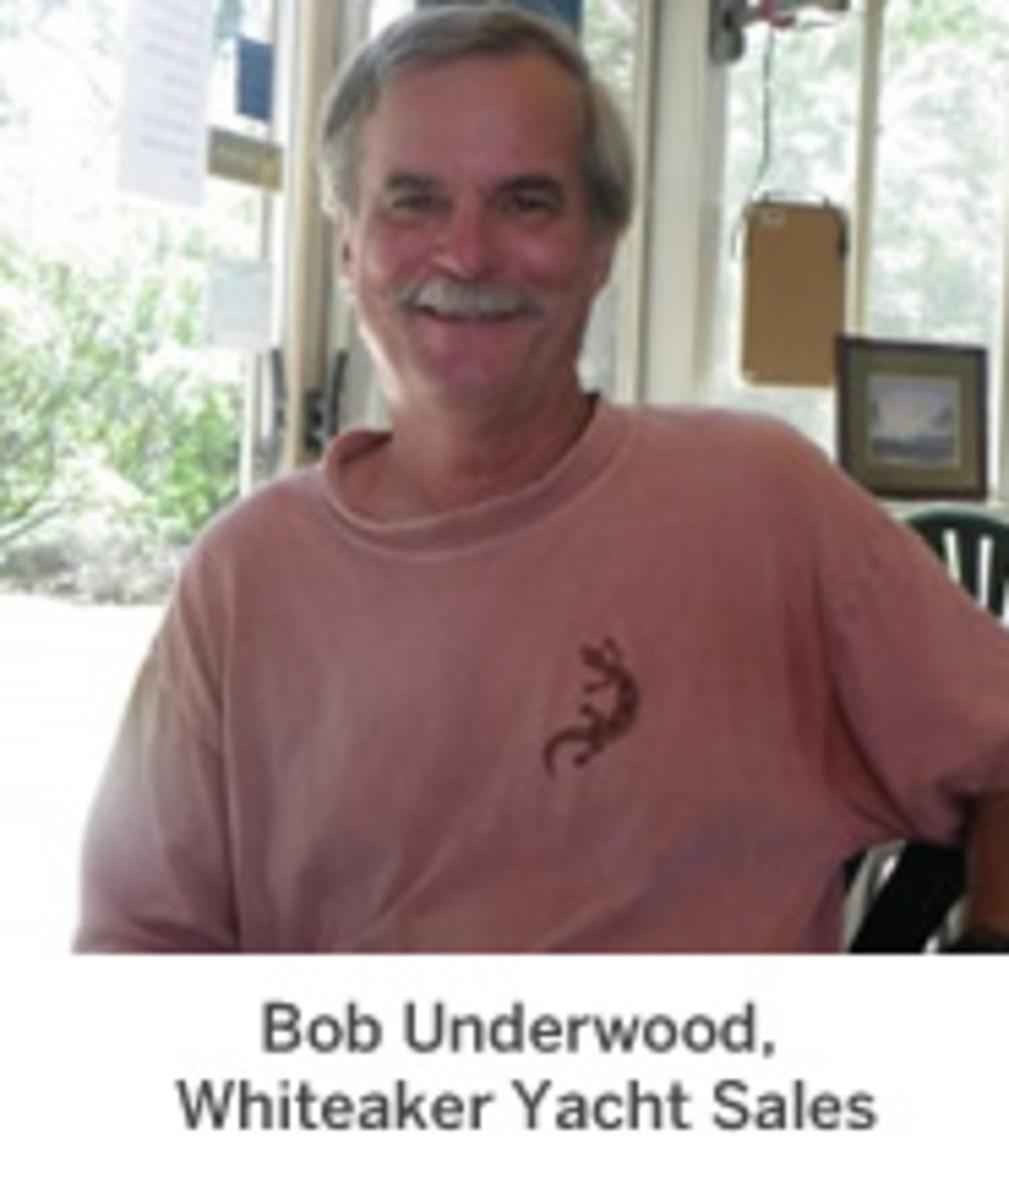 Bob Underwood, Whiteaker Yacht Sales